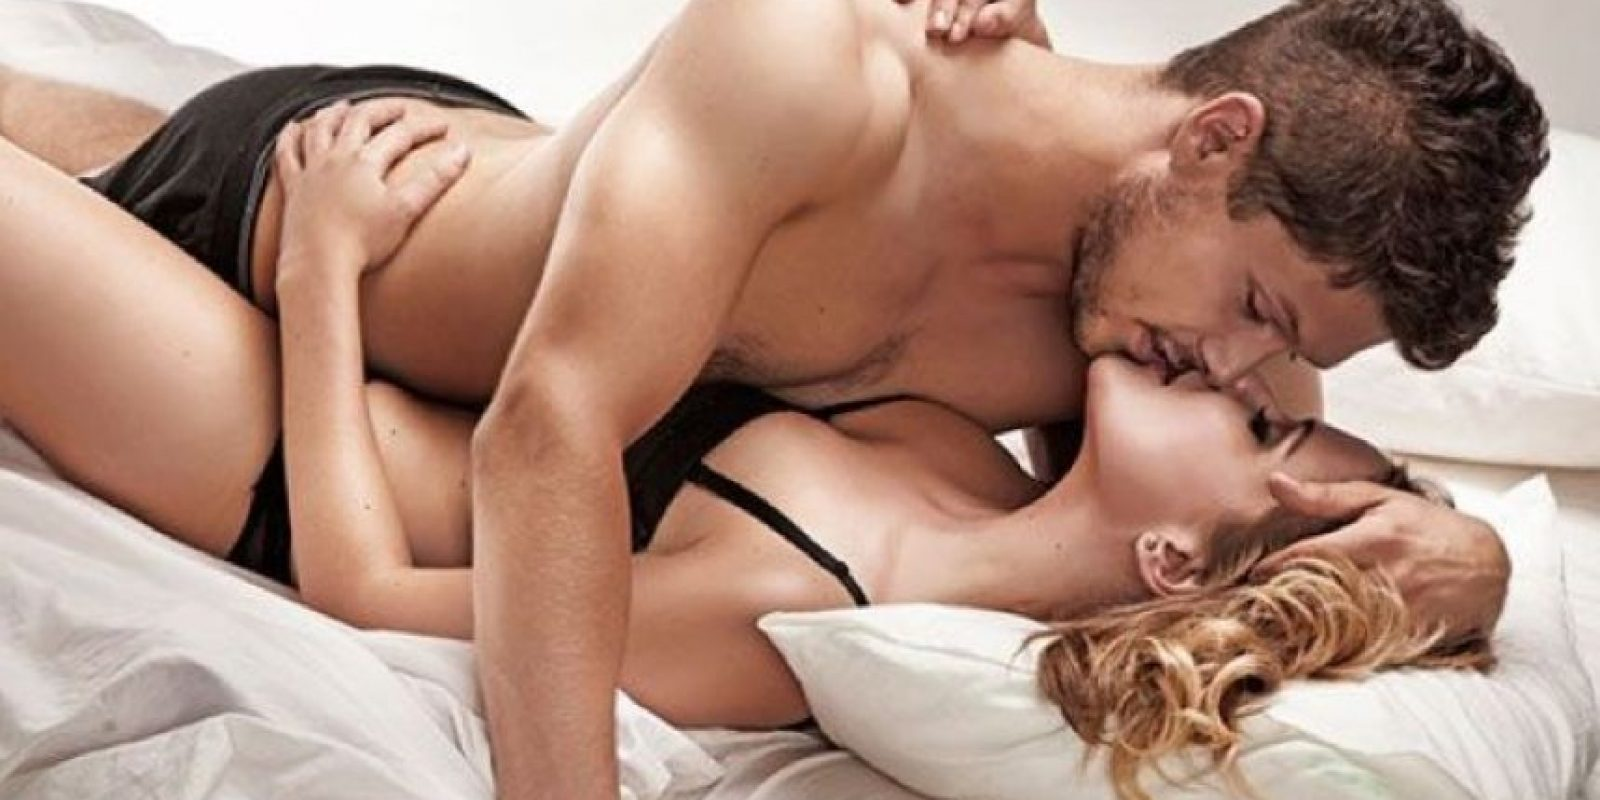 Foto:Tumblr.com/sexo